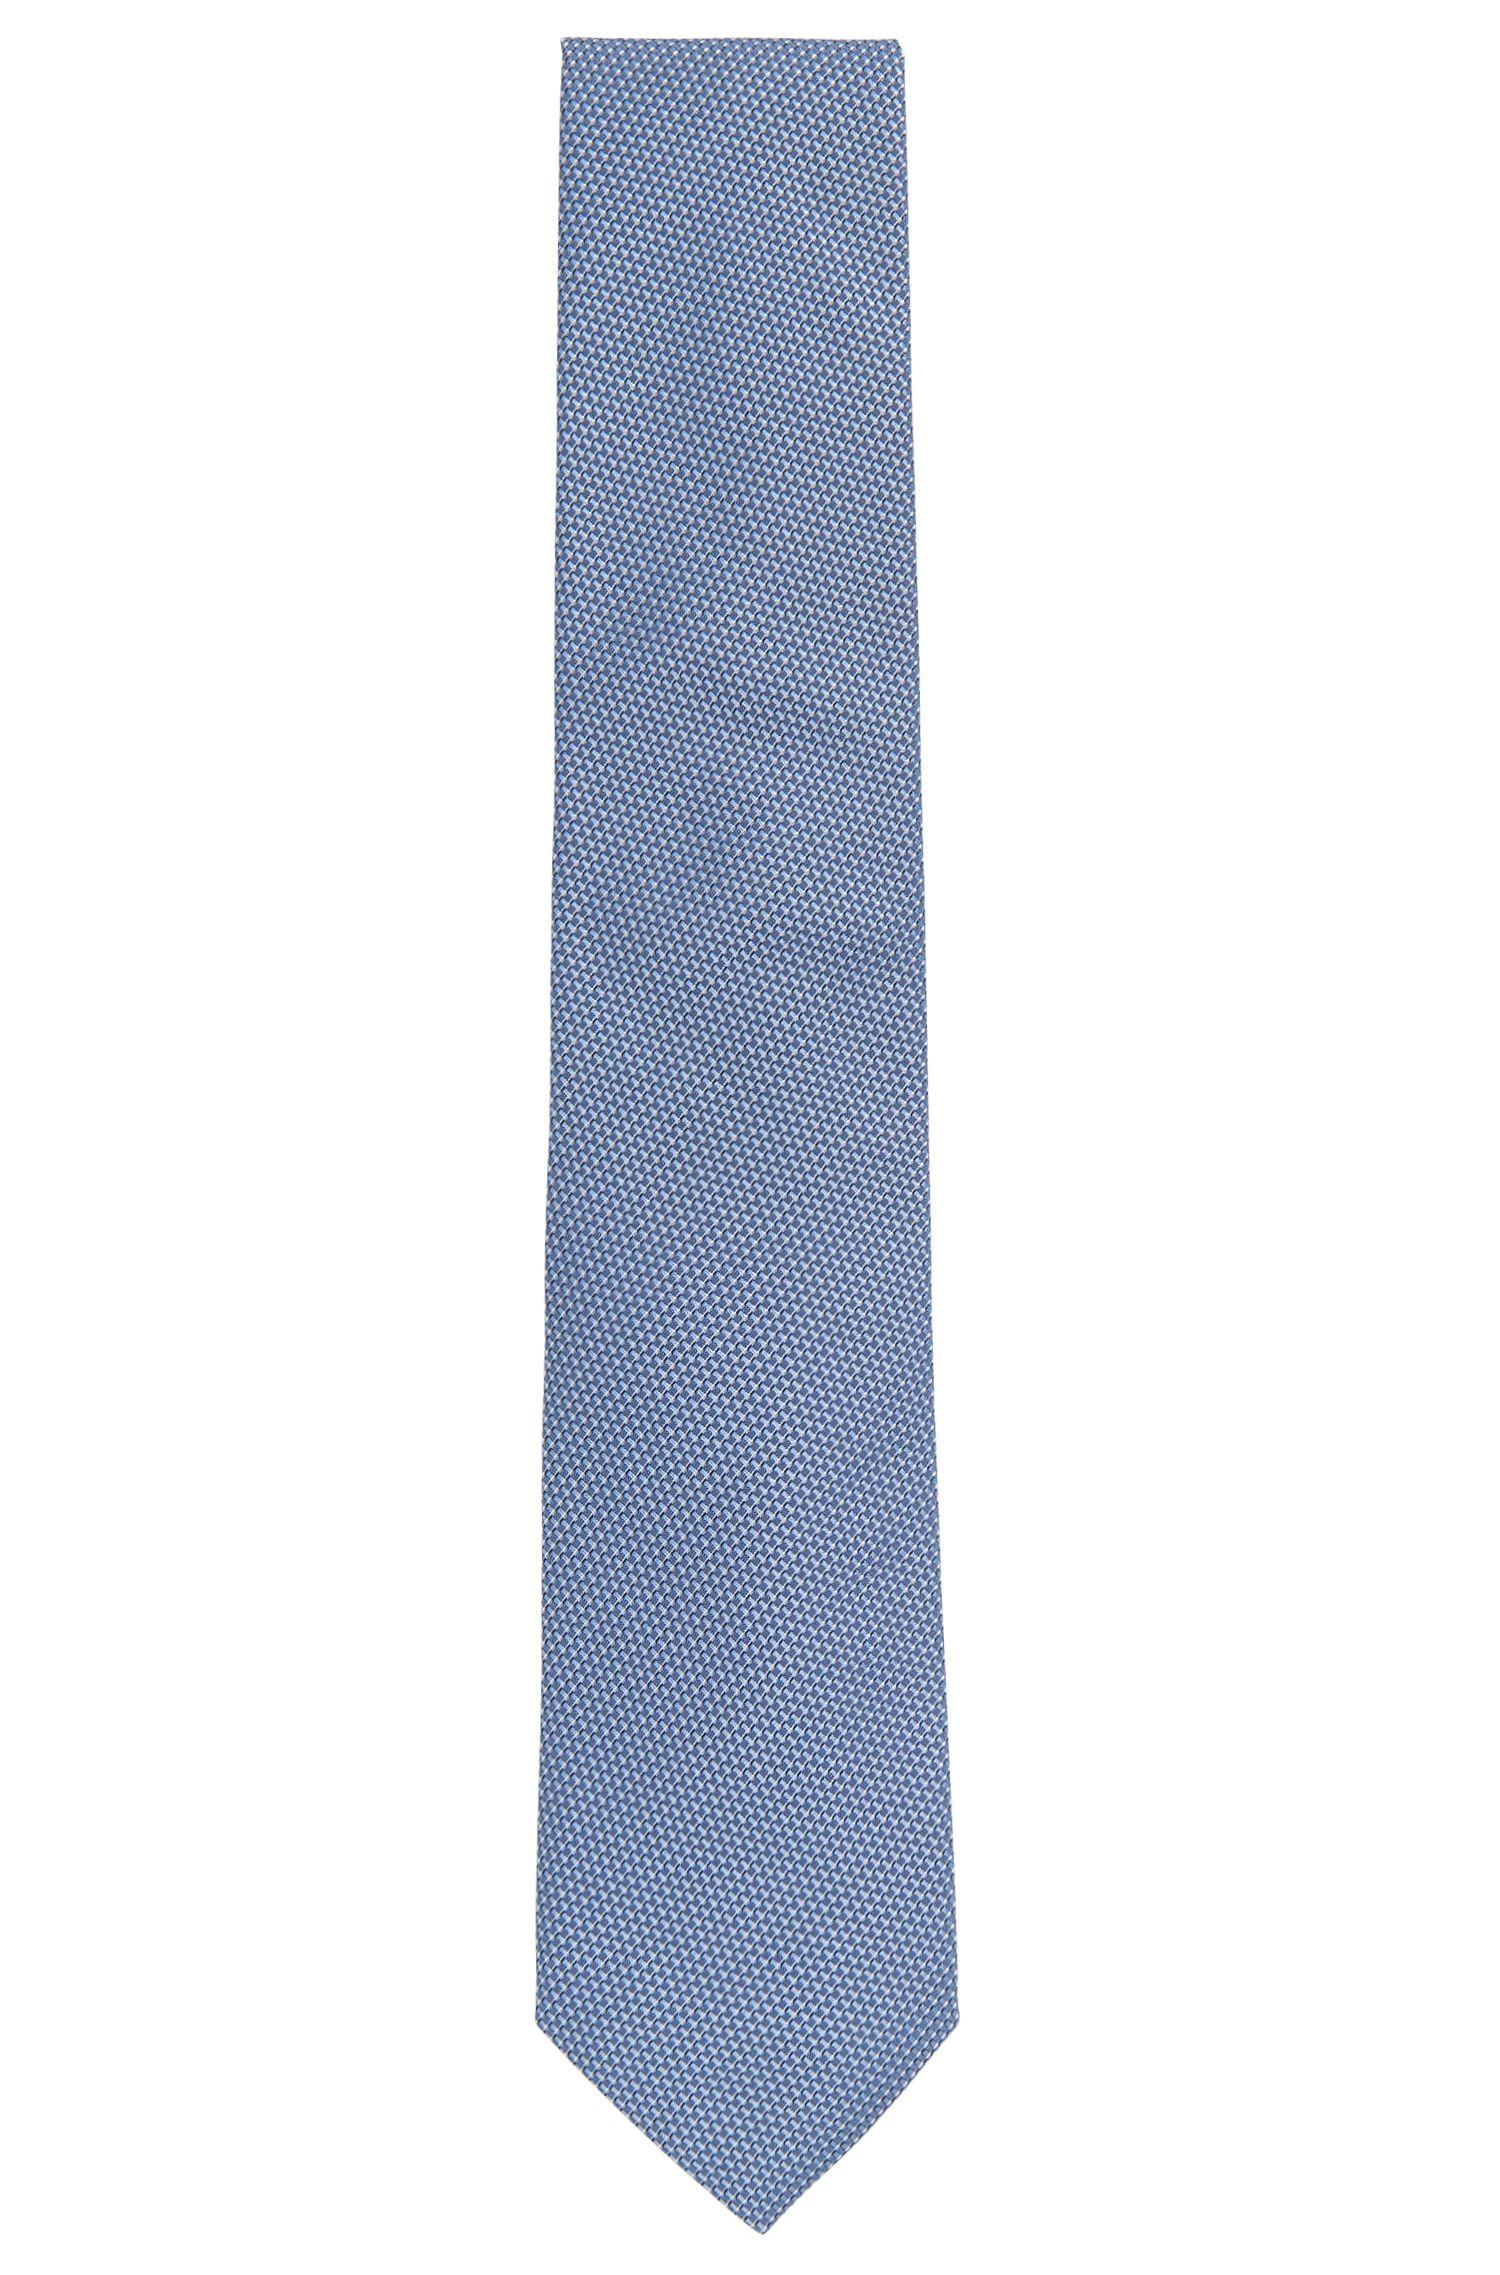 Corbata de jacquard de seda con microestampado fabricada en Italia